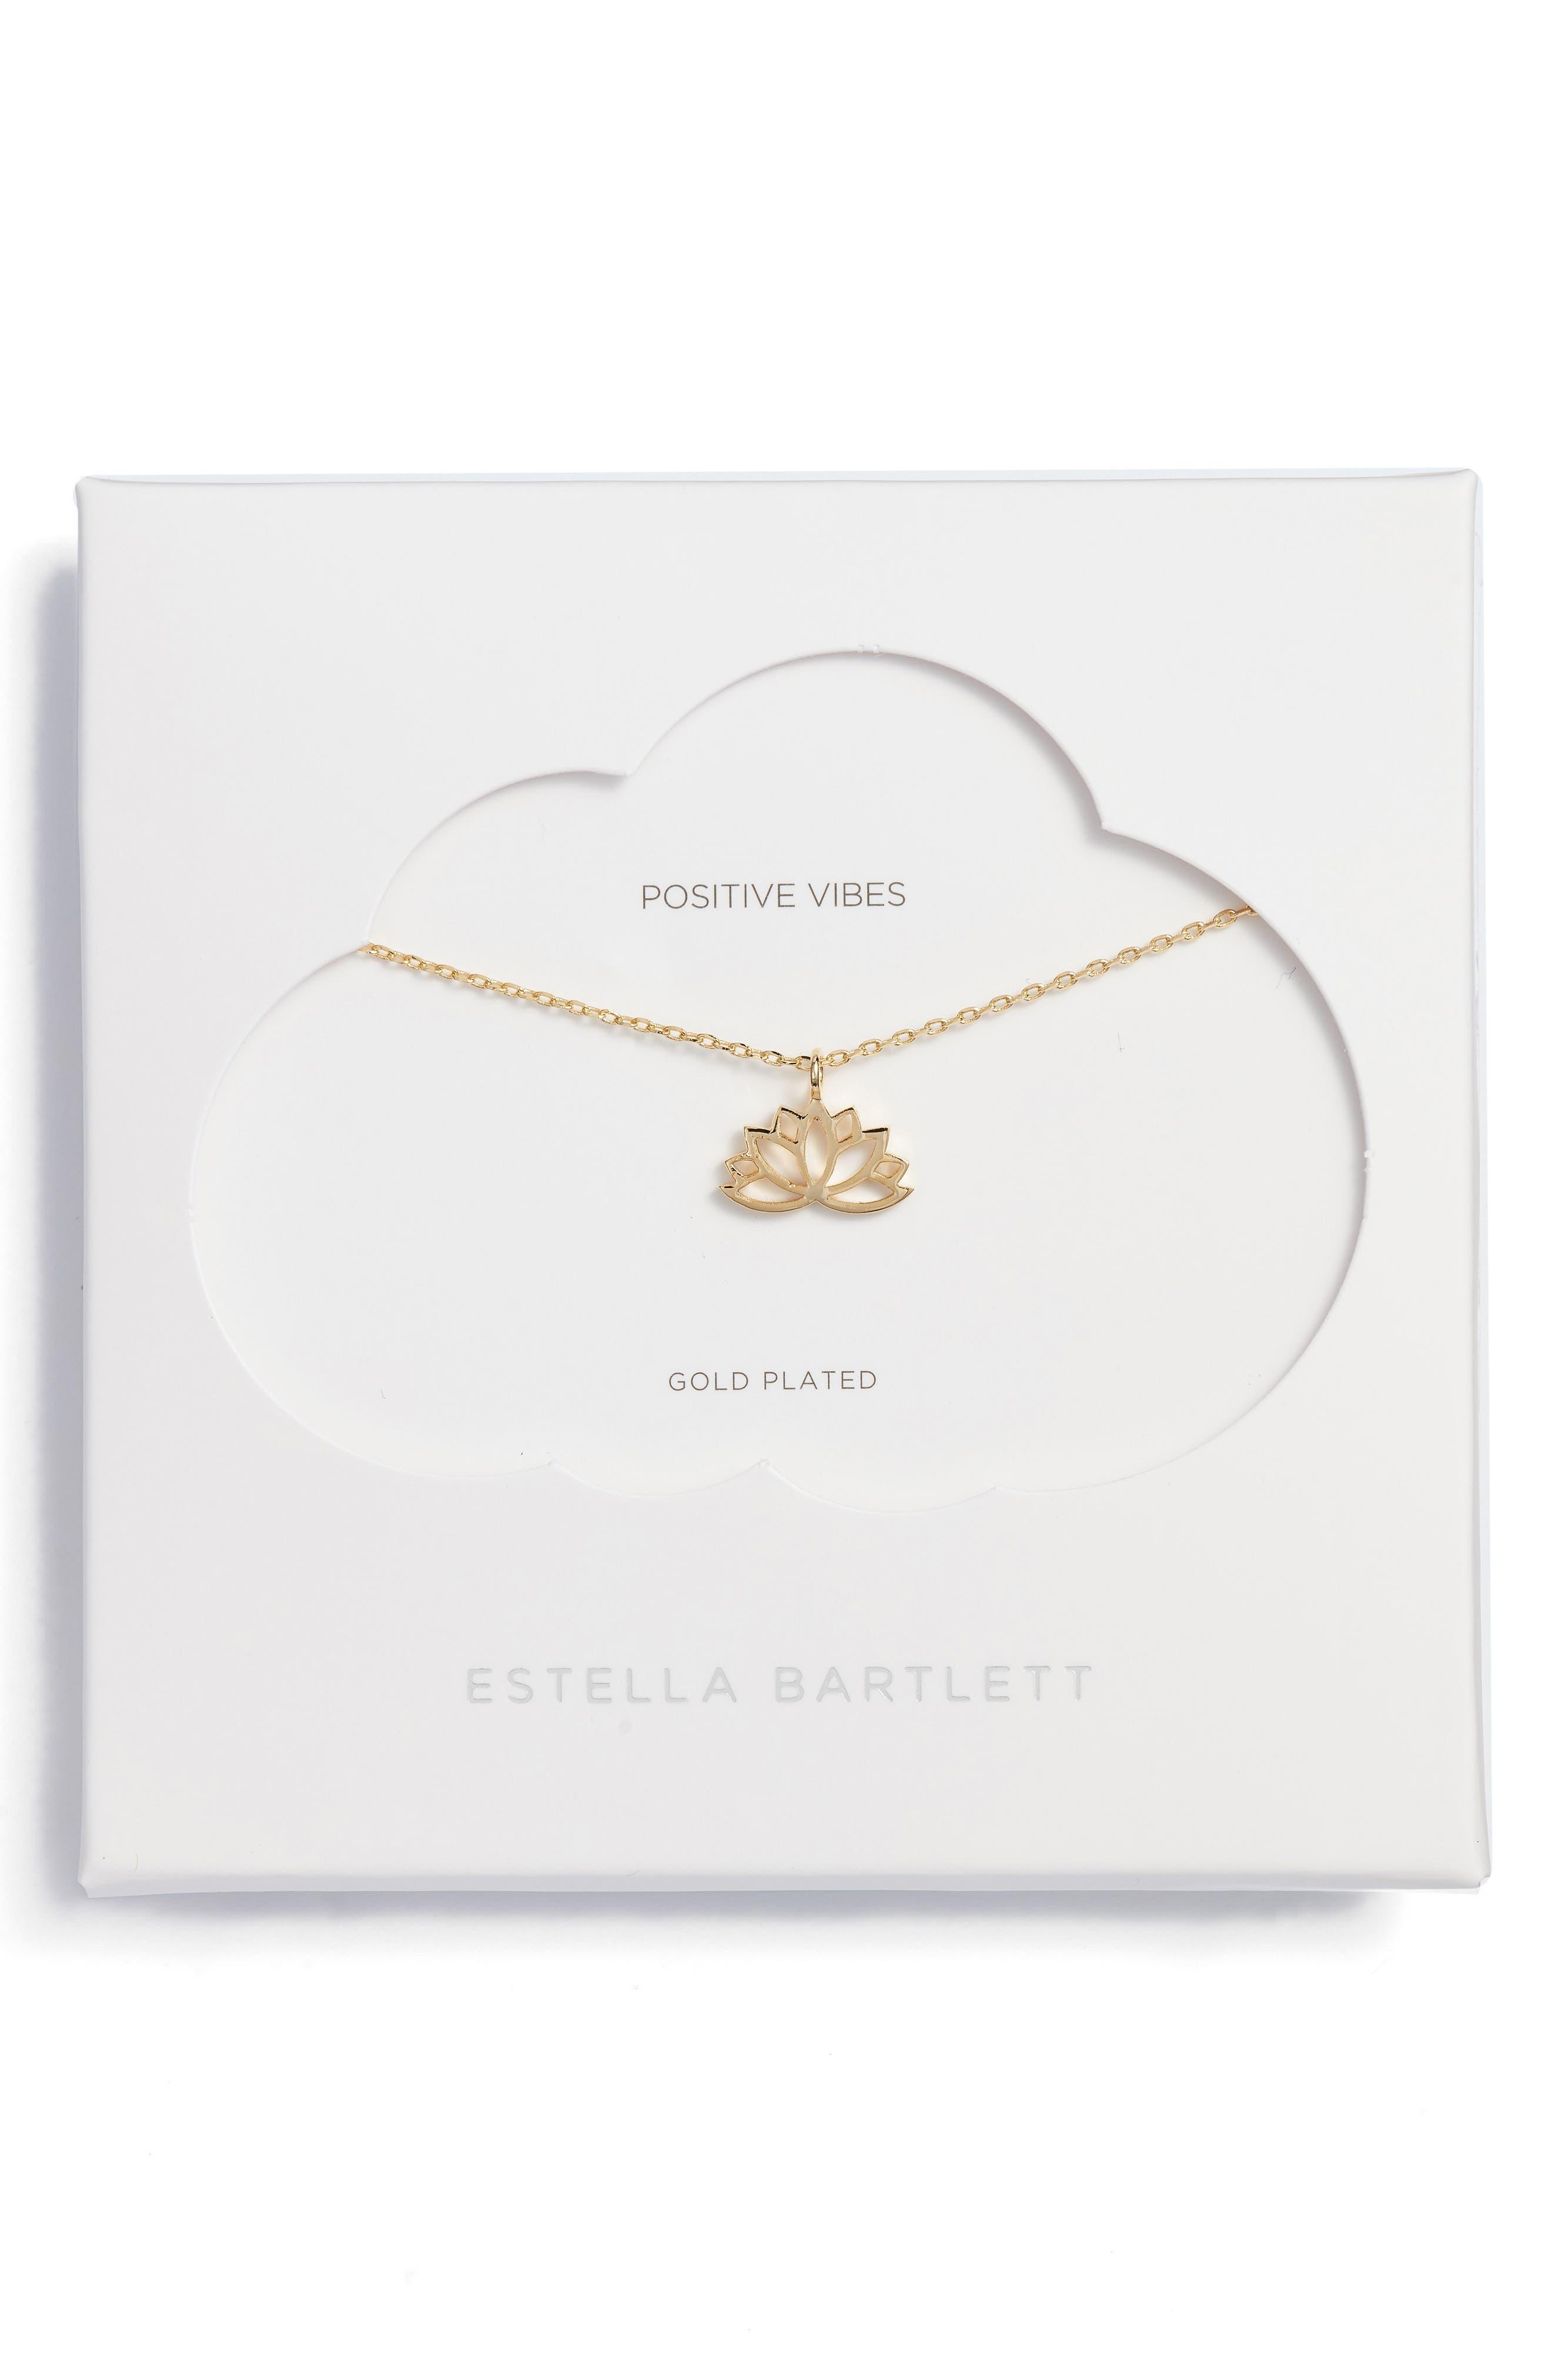 Lotus Leaf Pendant Necklace